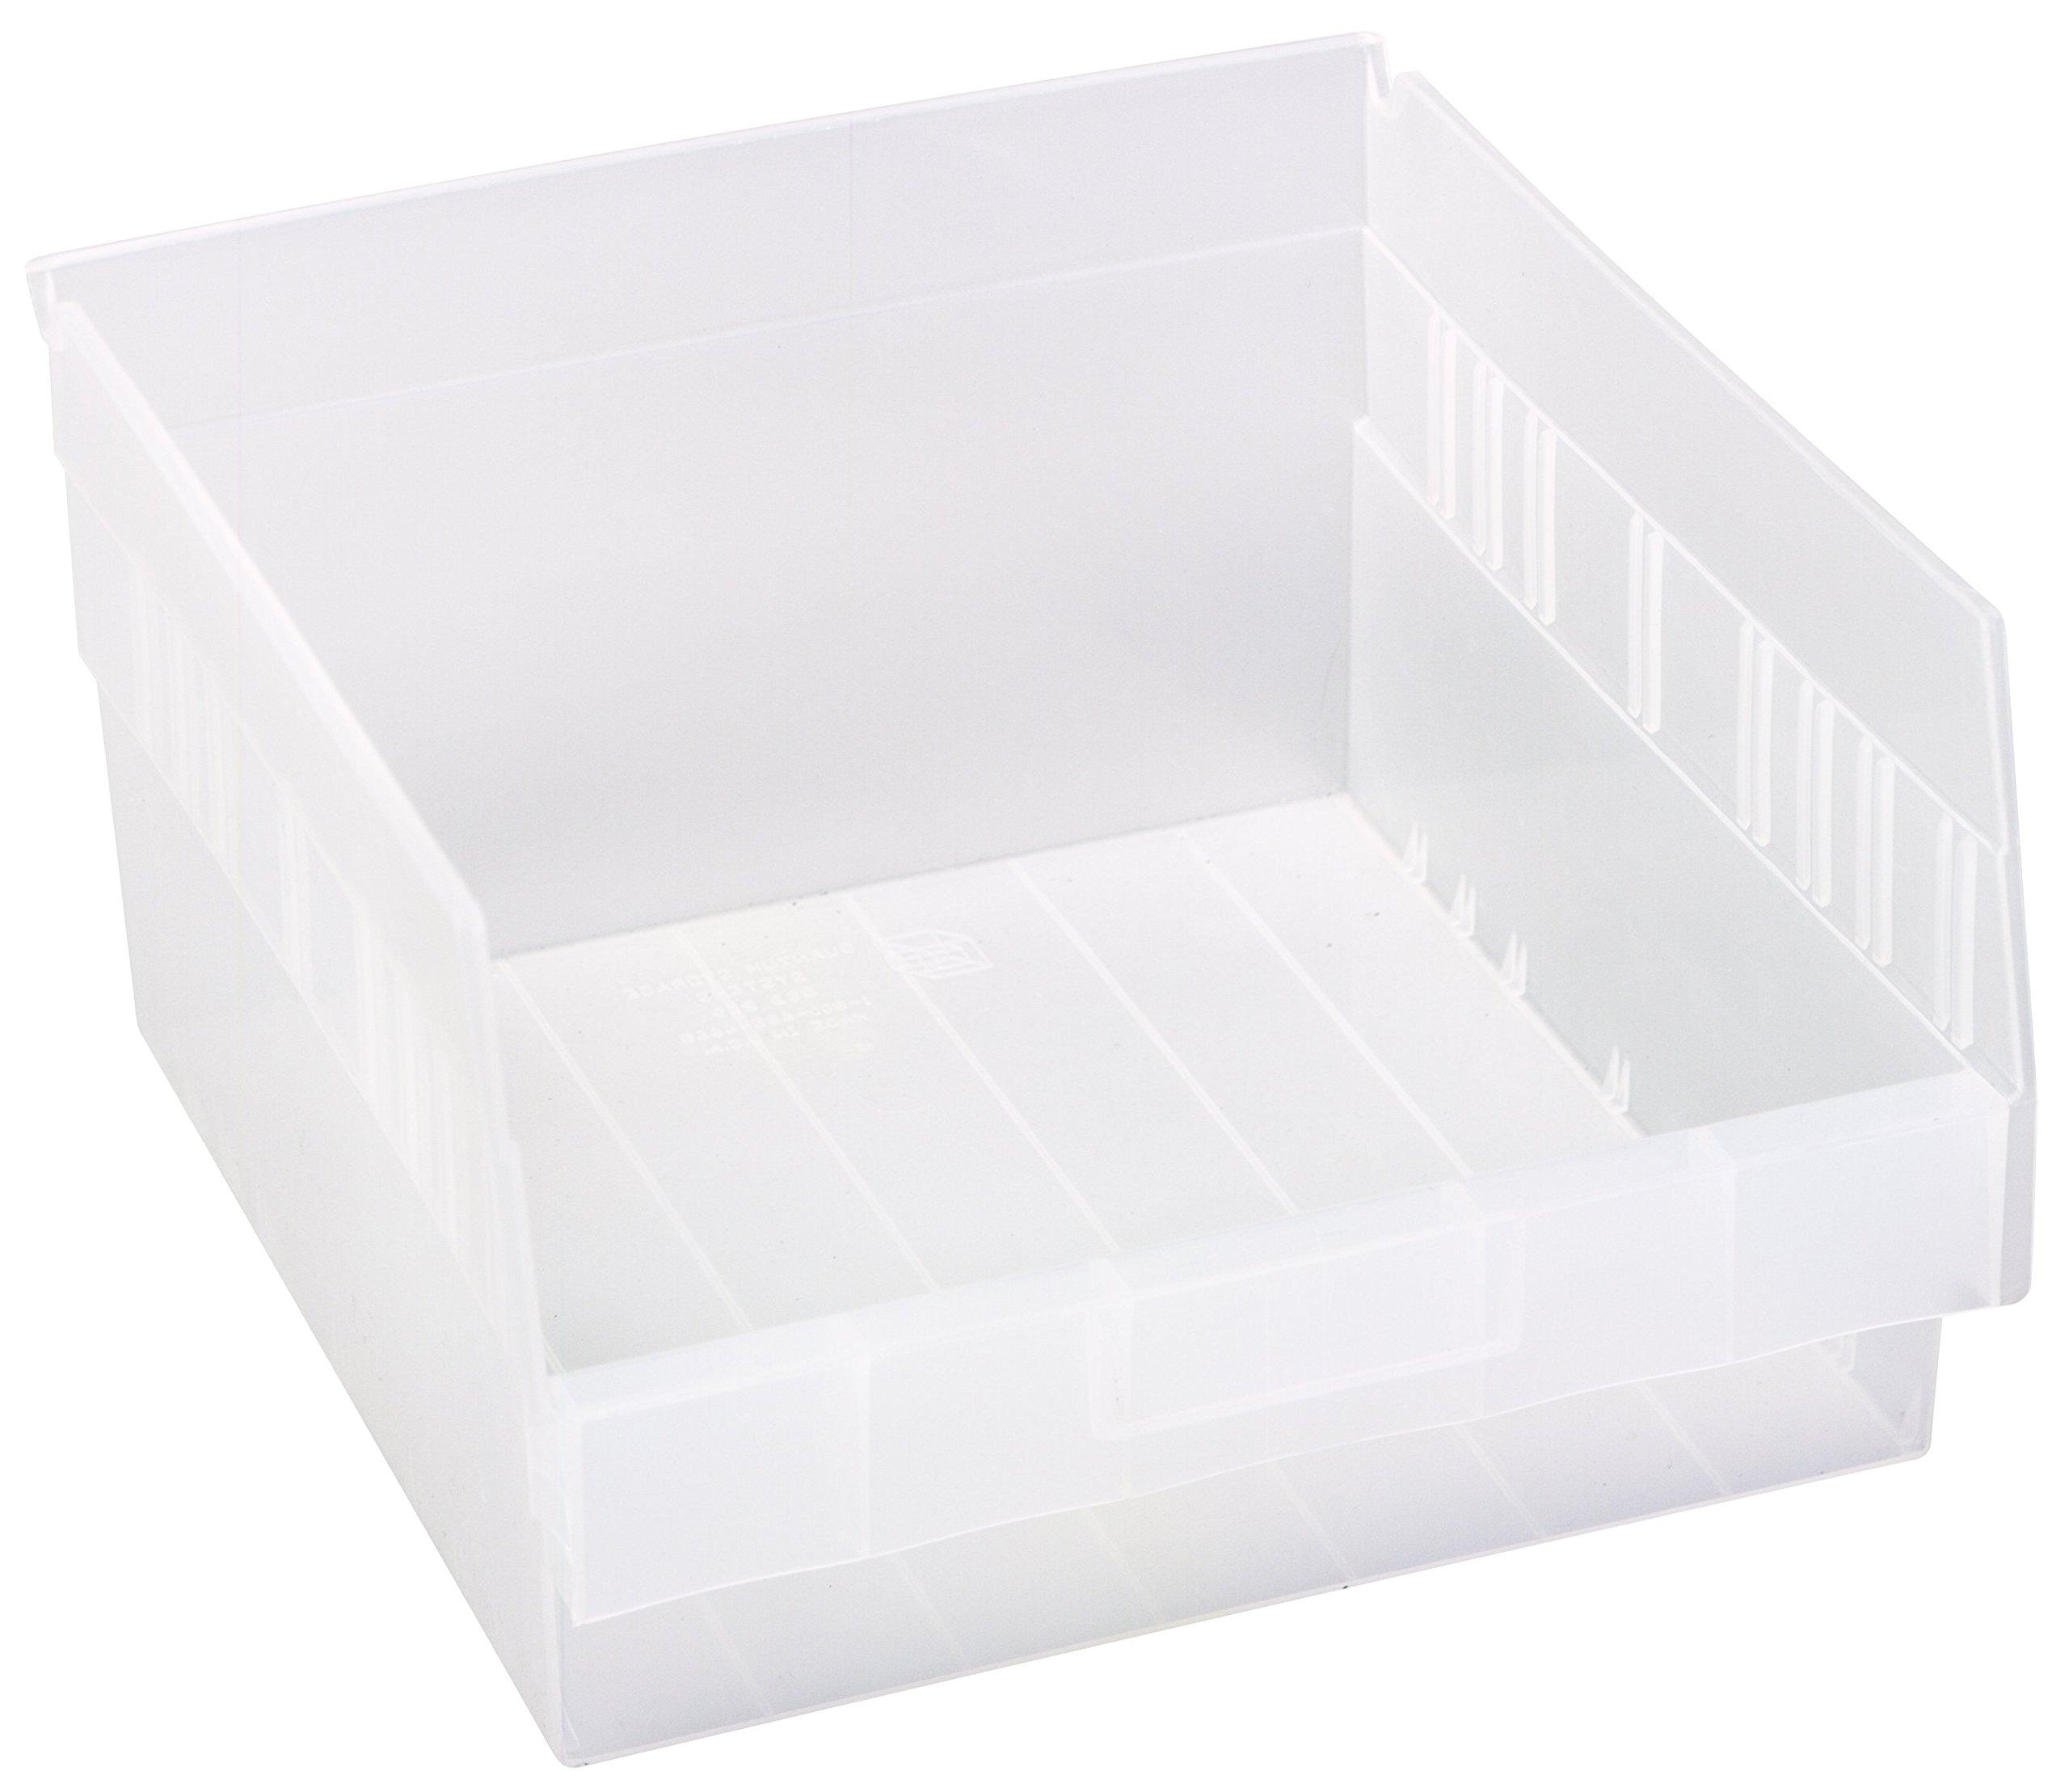 Quantum QSB209CL Store More Shelf Bin, 11-5/8'' Length x 11-1/8'' Width x 6'' Height, Clear, Pack of 8 by Quantum